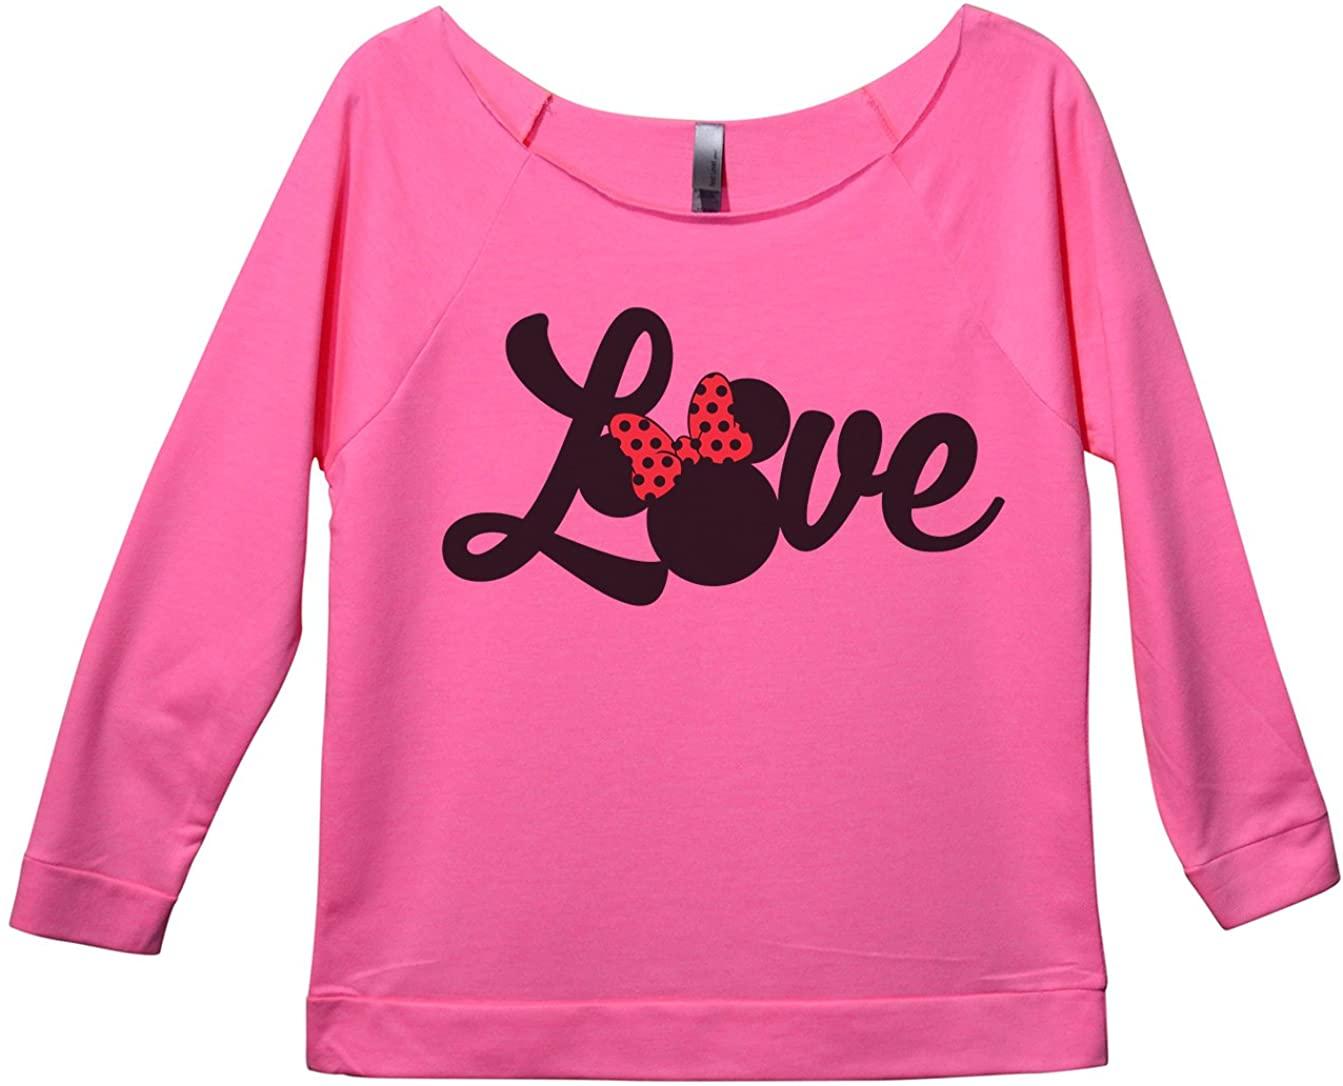 "Womens Minnie Mouse 3/4 Sleeve ""Love Disney World Sweat Shirt Gift"